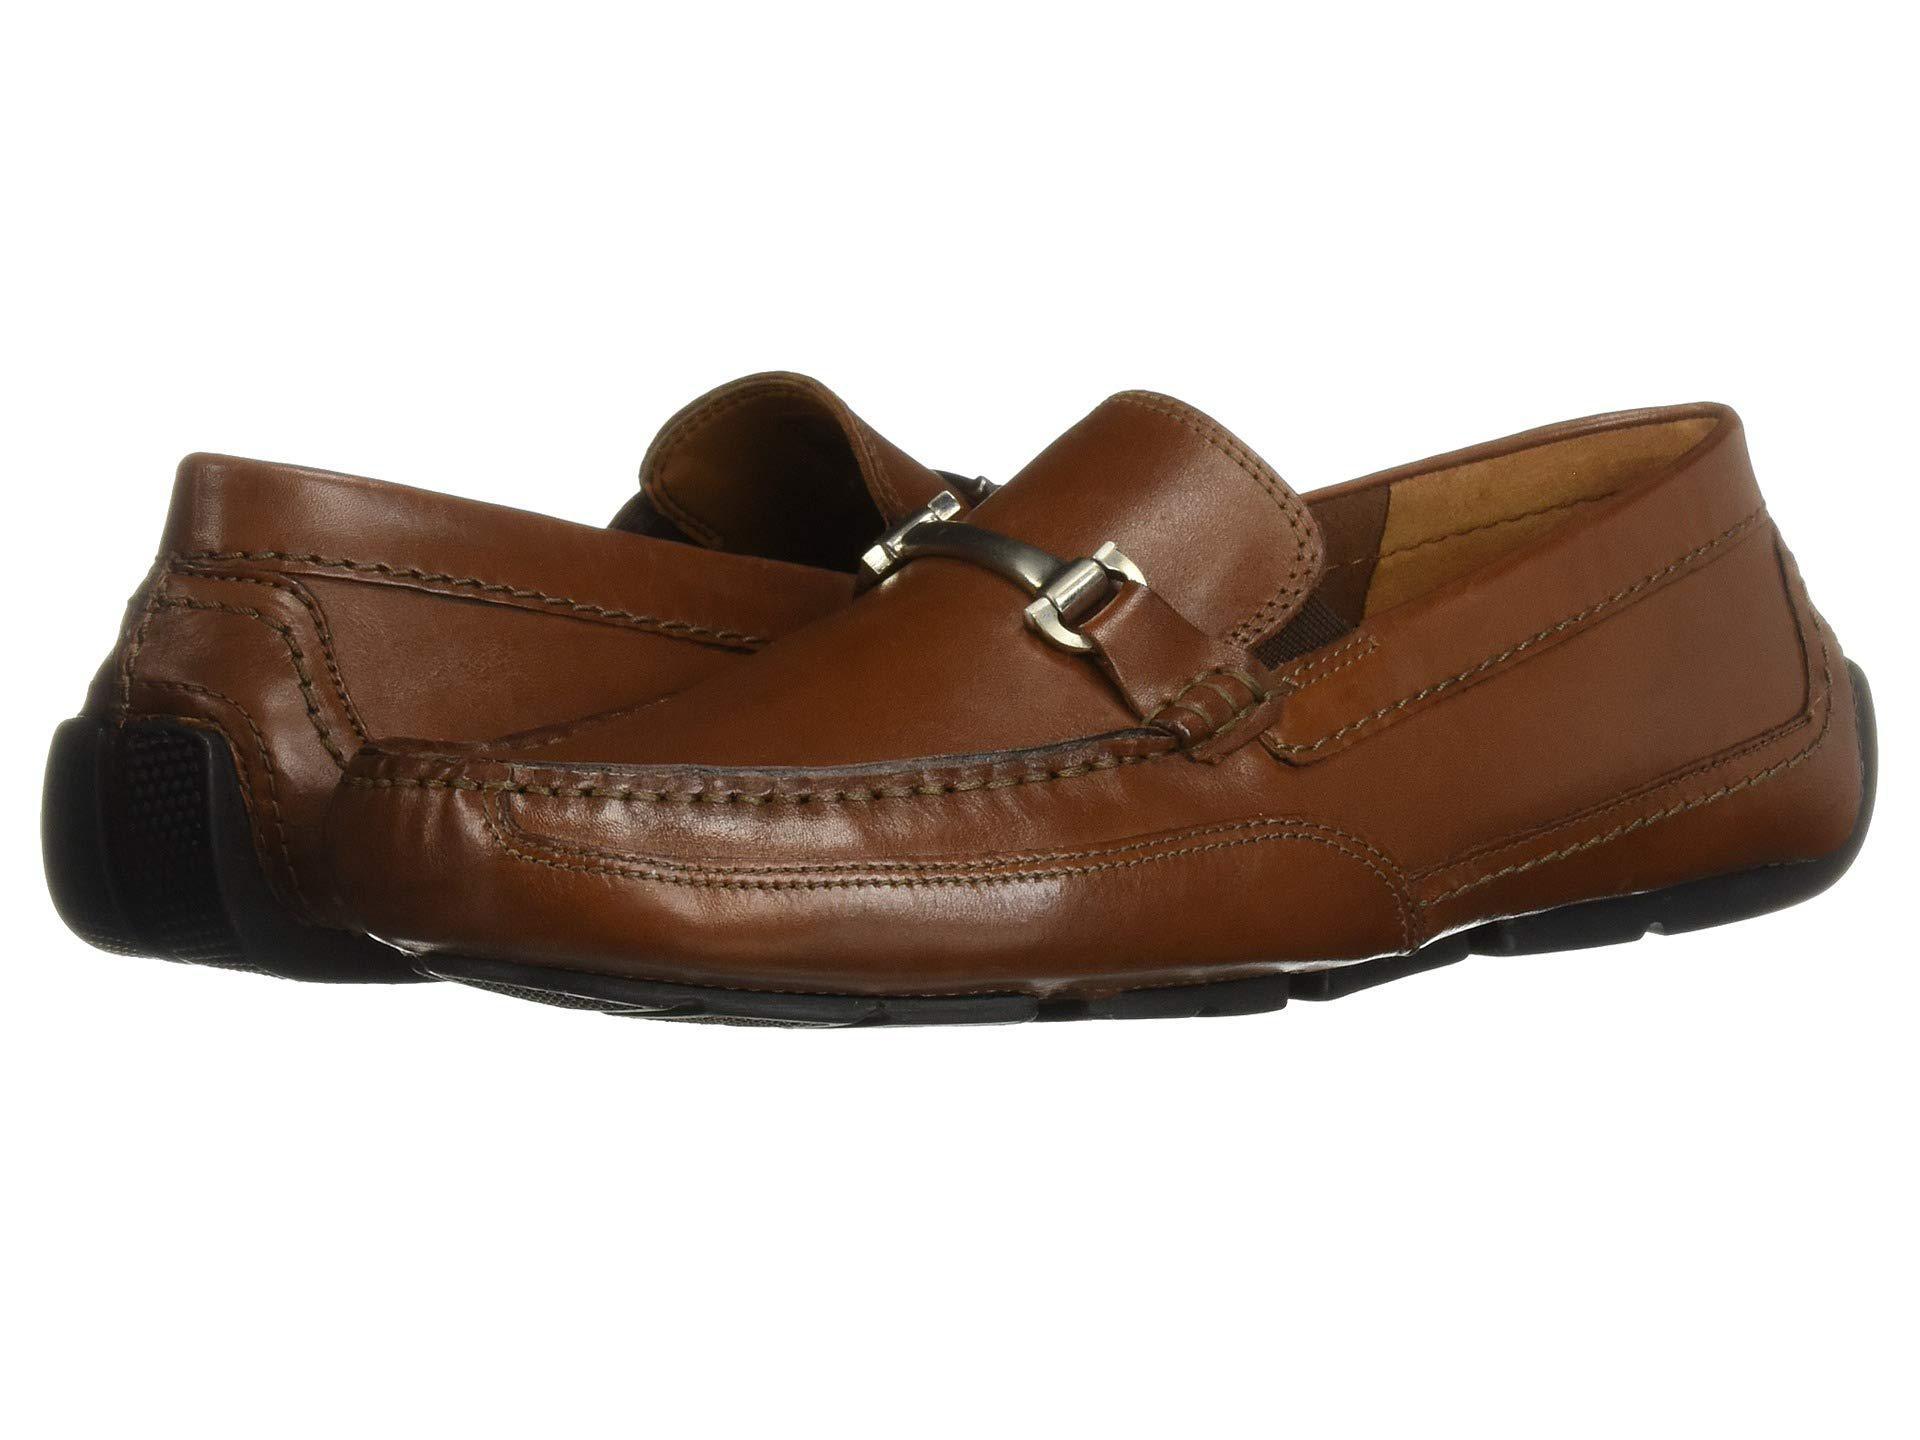 c9143ea92 Lyst - Clarks Ashmont Brace in Brown for Men